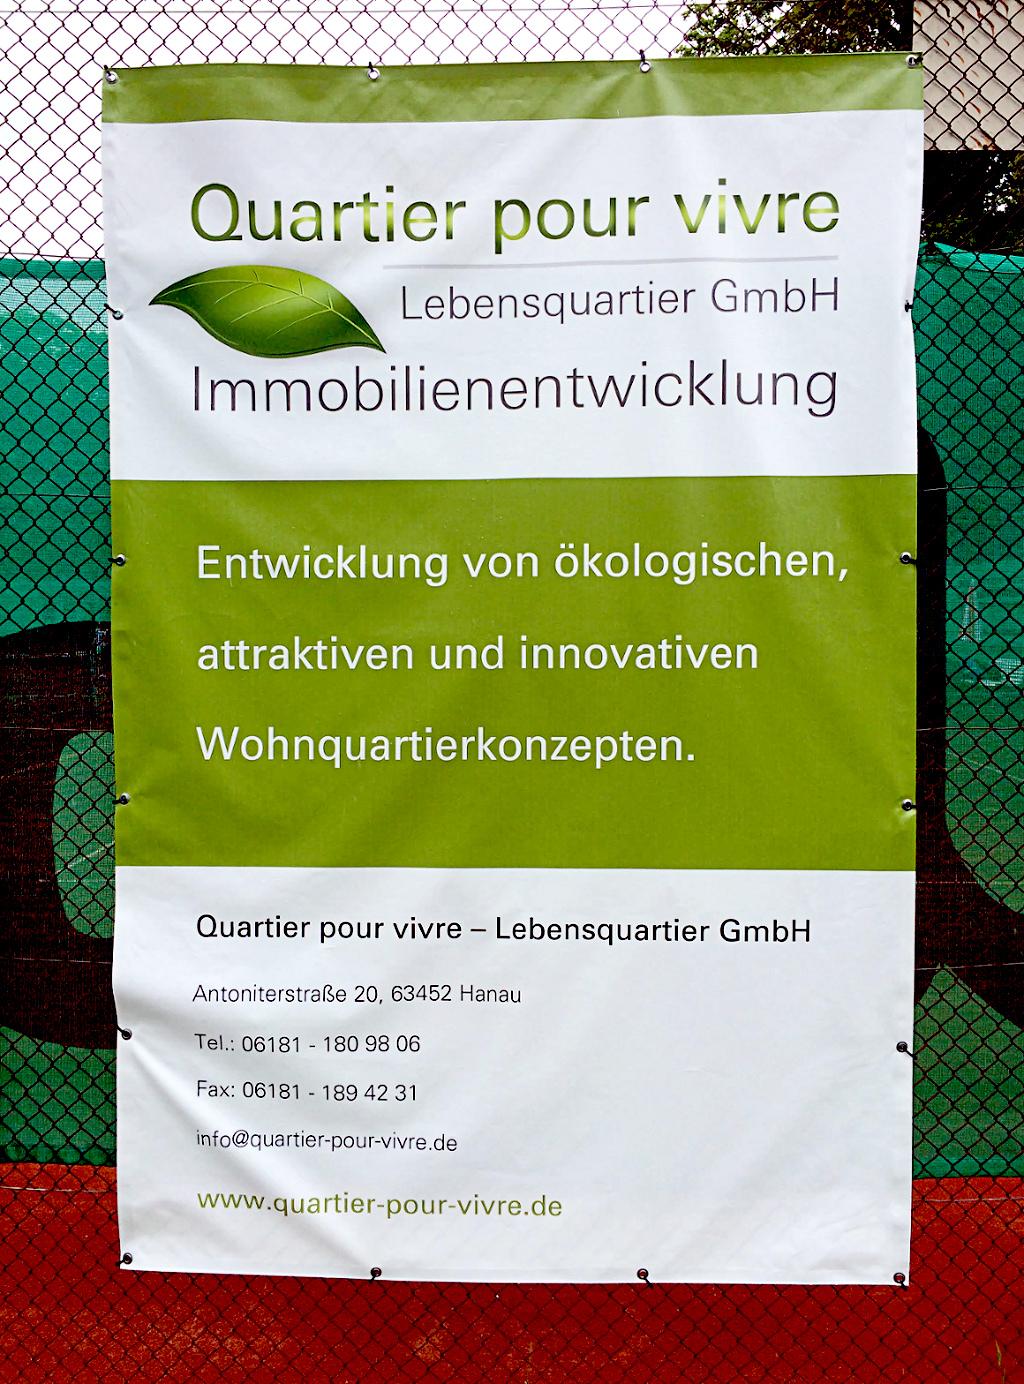 QPV-Werbung2b